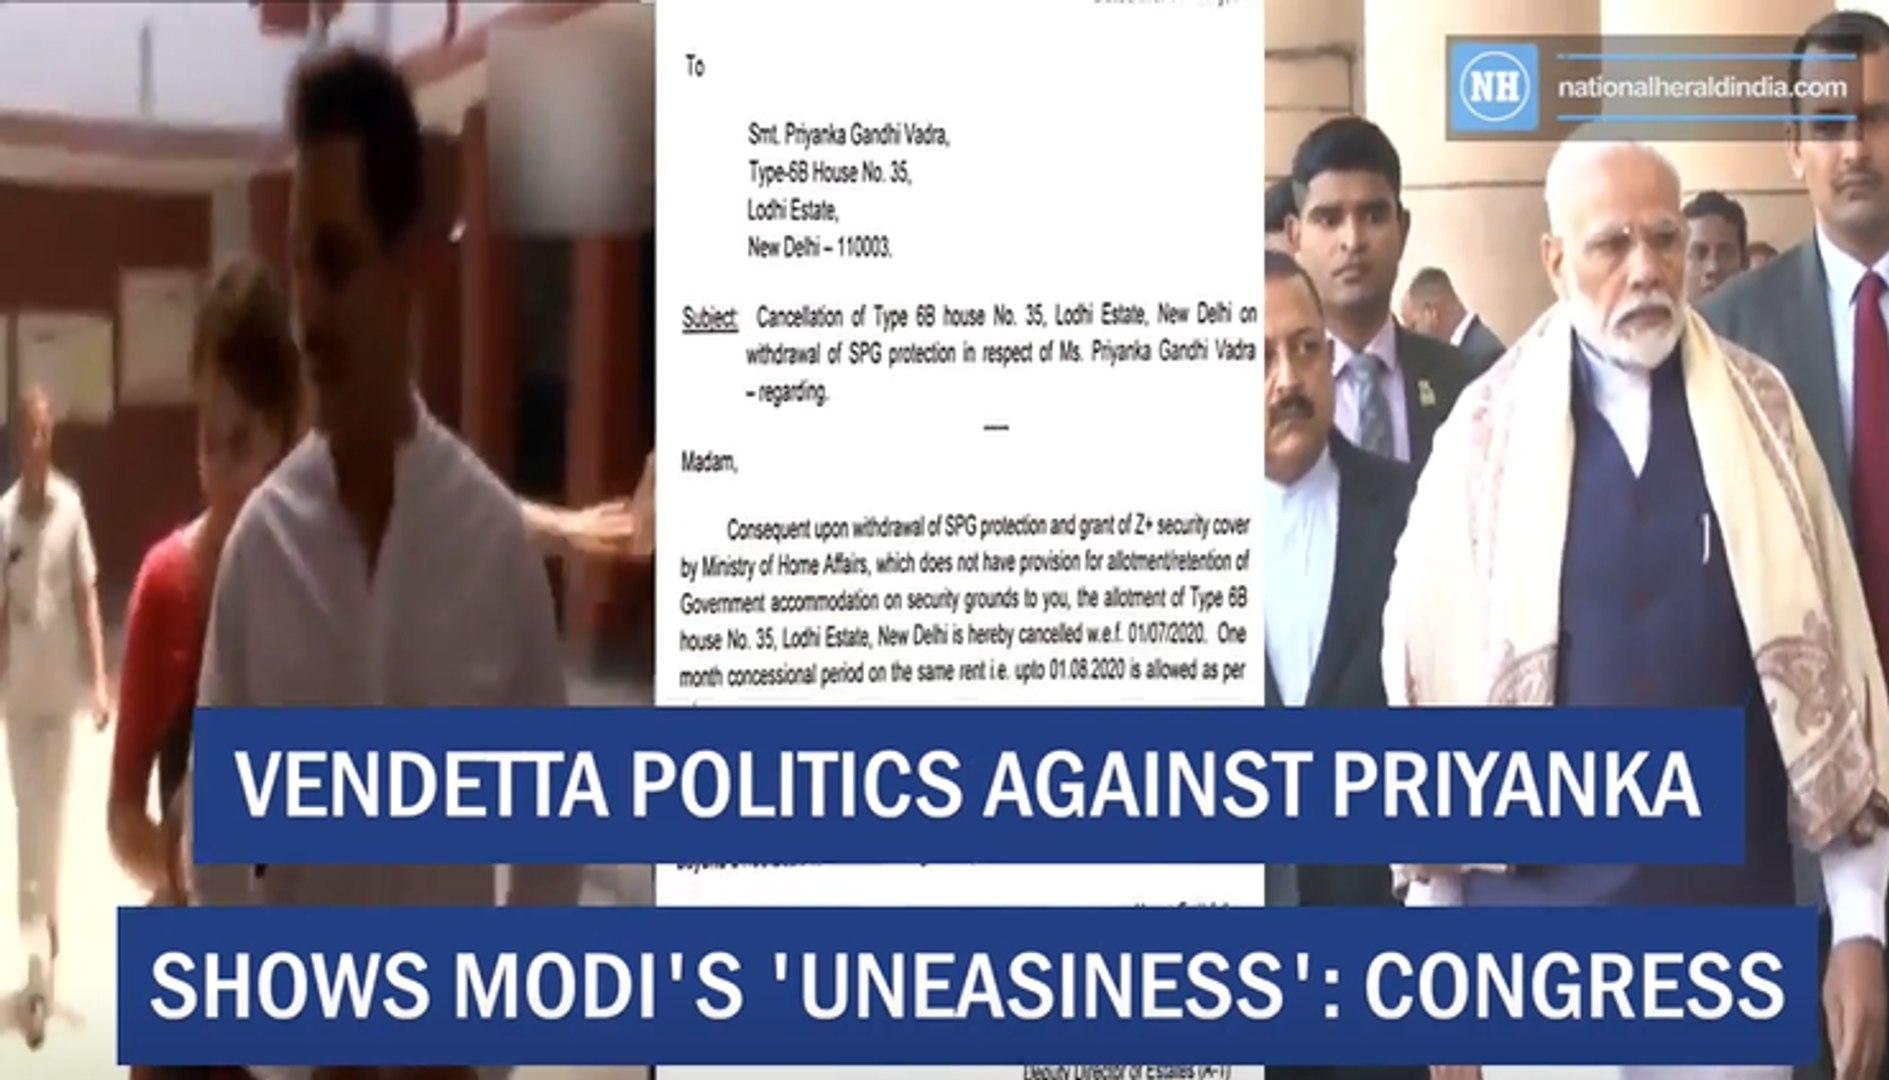 Vendetta Against Priyanka Shows Modi's 'Uneasiness'- Congress